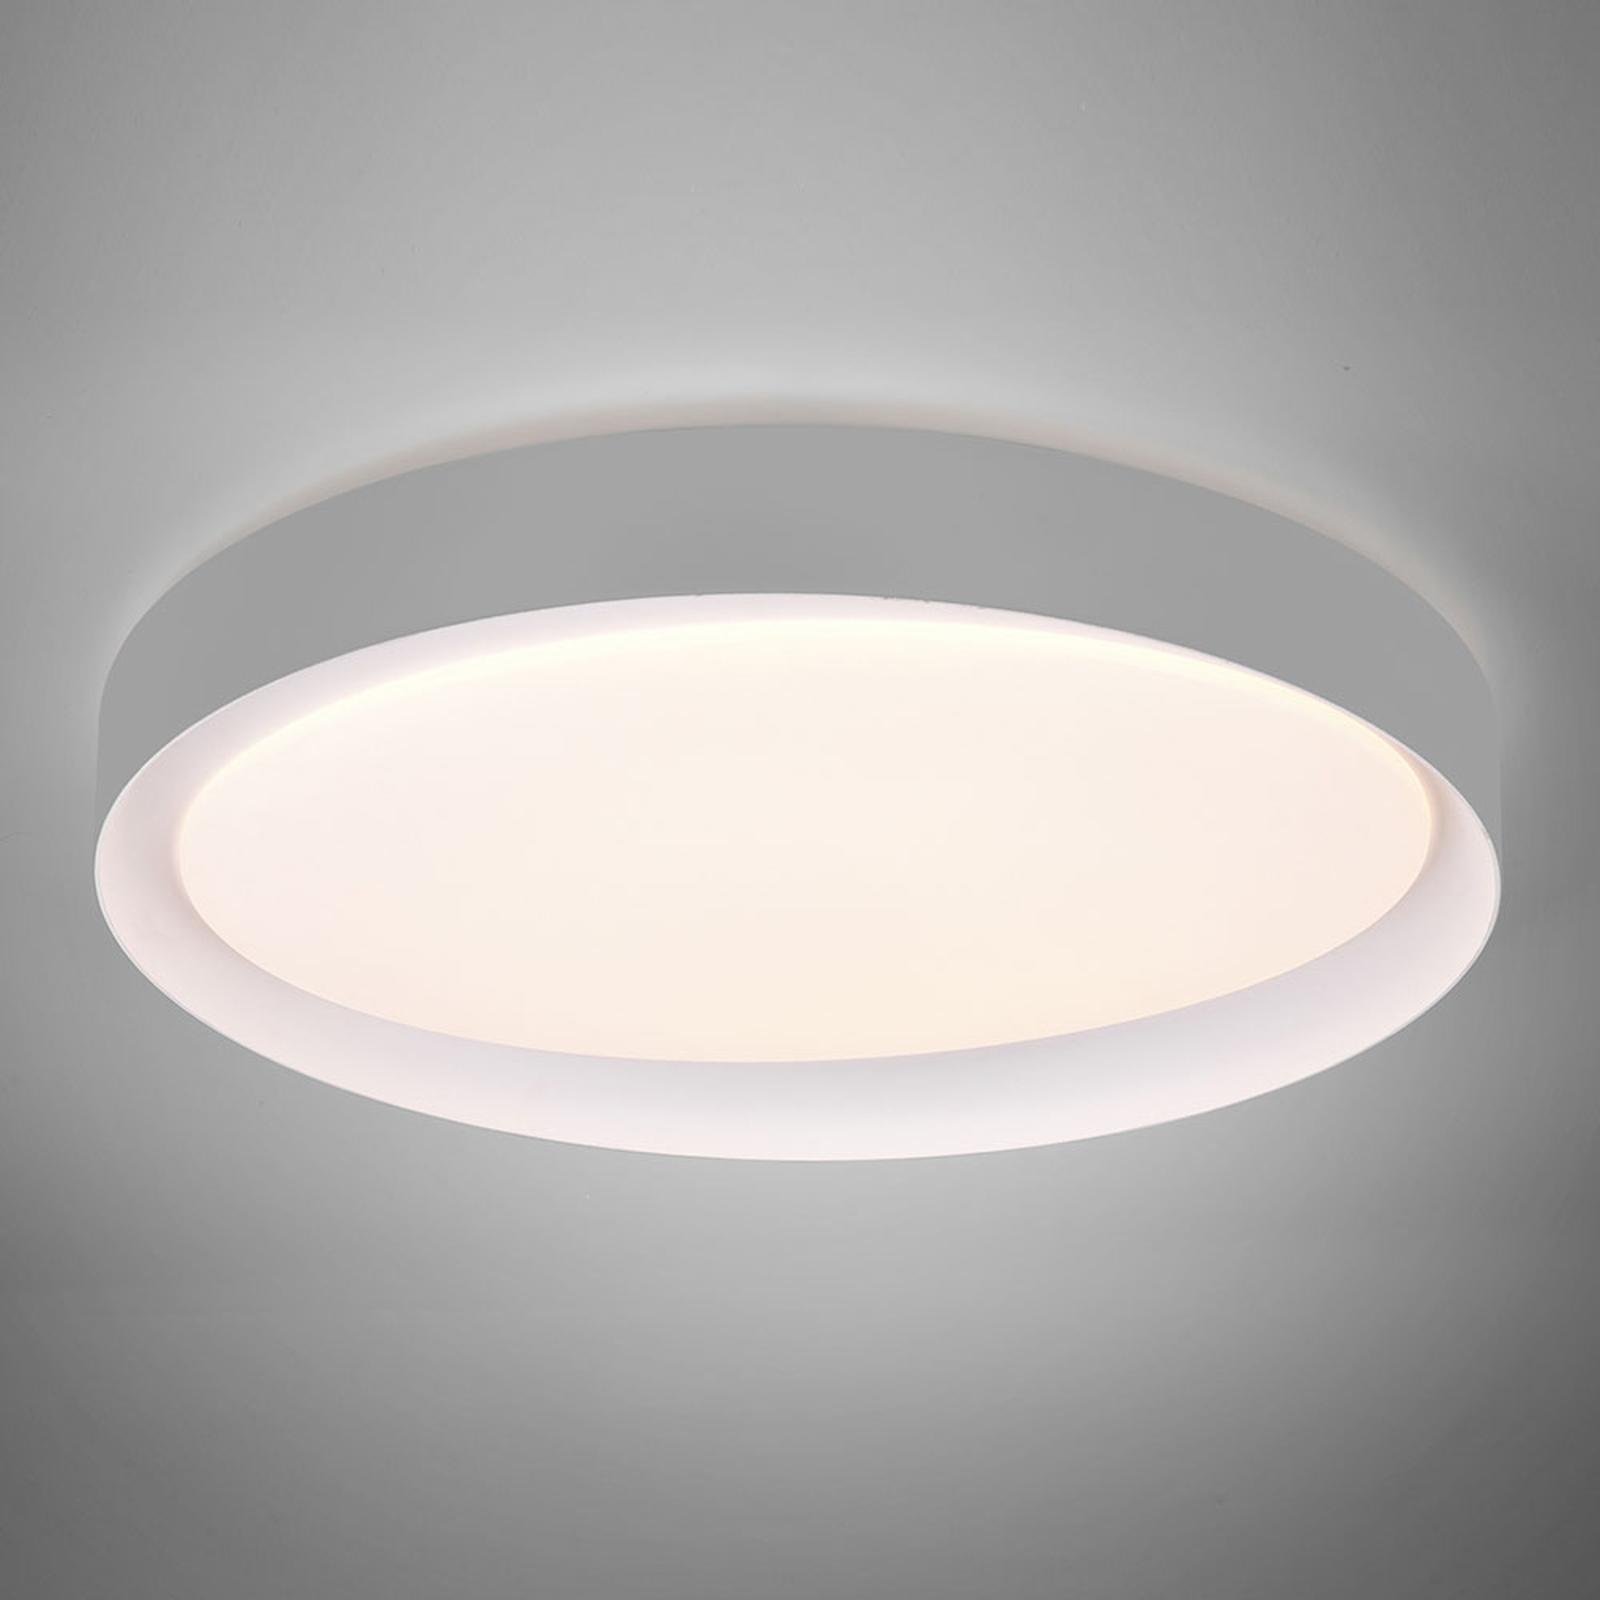 LED-Deckenleuchte Zeta tunable white, grau/weiß